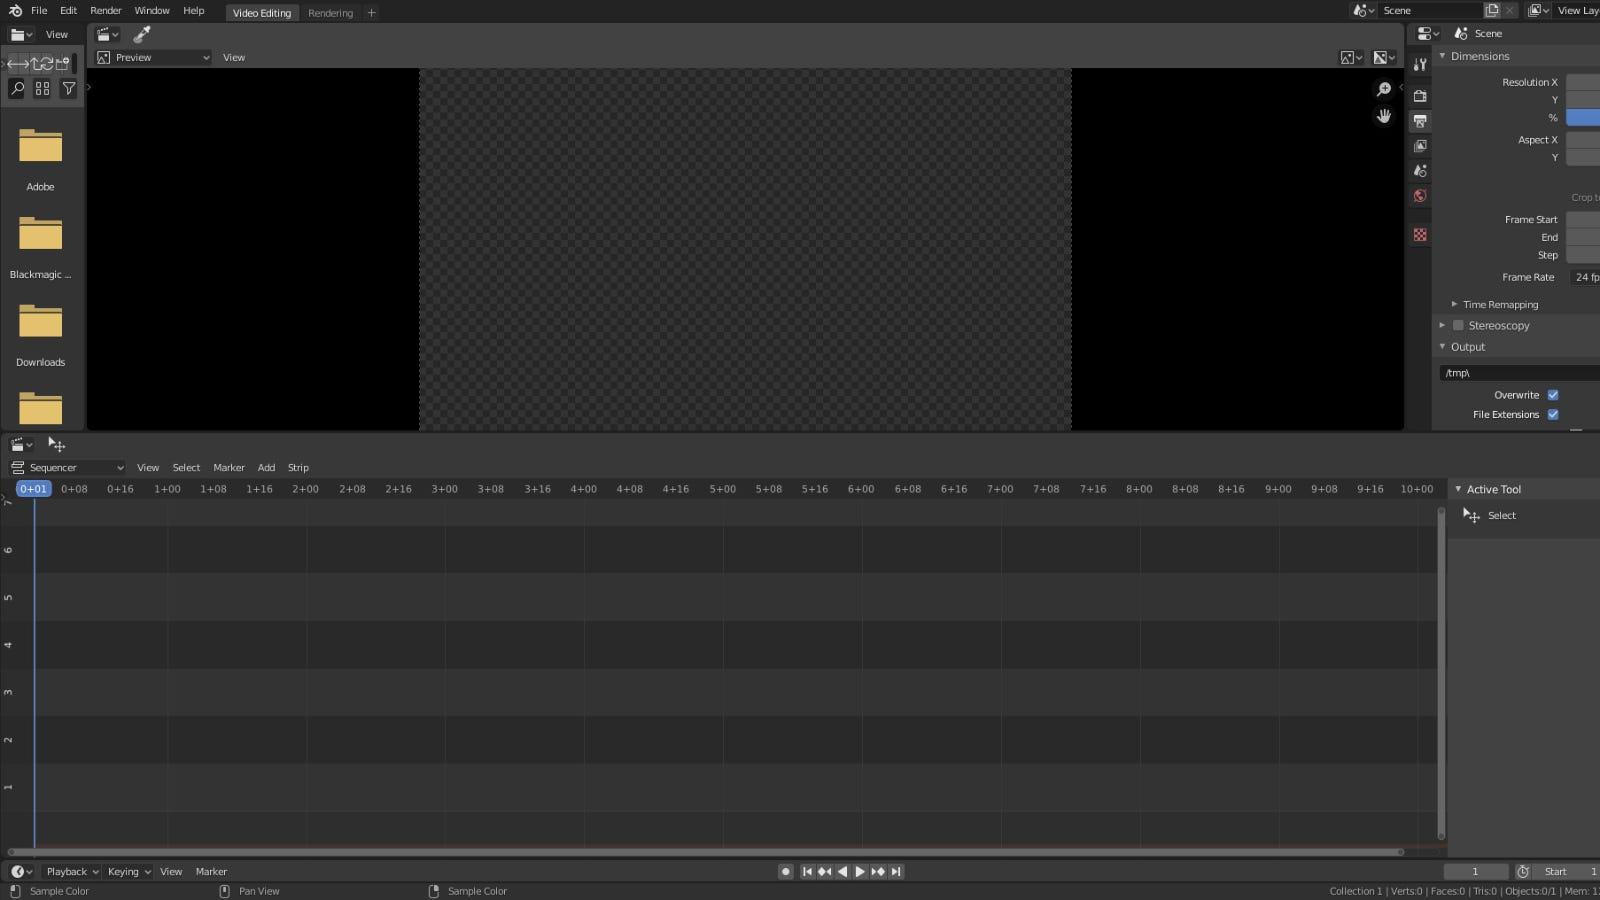 Blender main video editing window